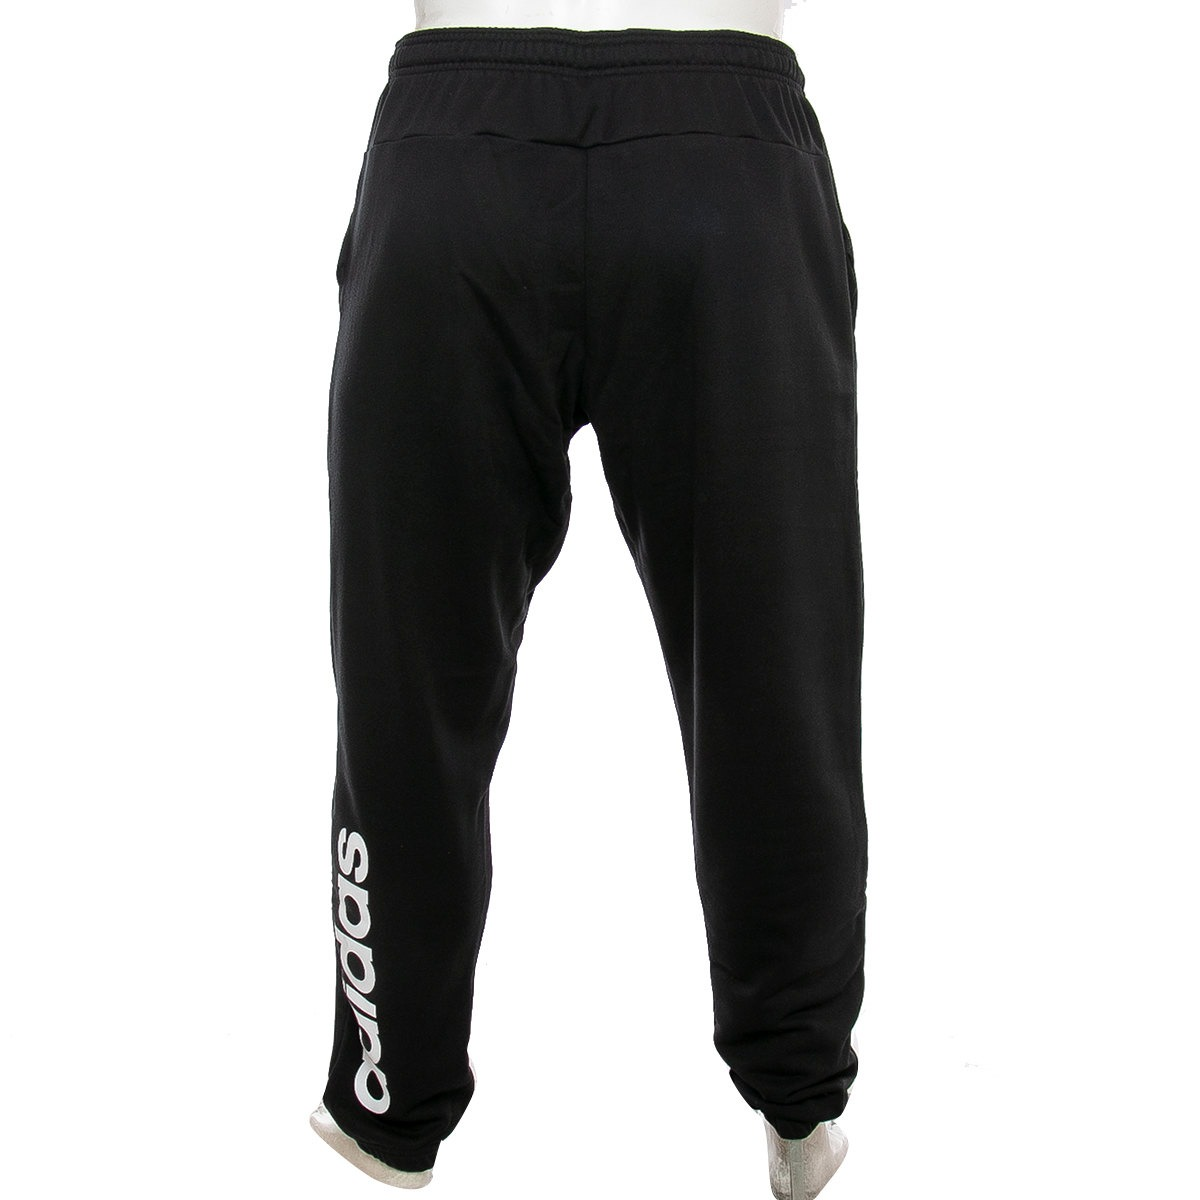 Tienda Adidas Sport Linear Pantalon Oficial 78 Essentials zqMpVSU